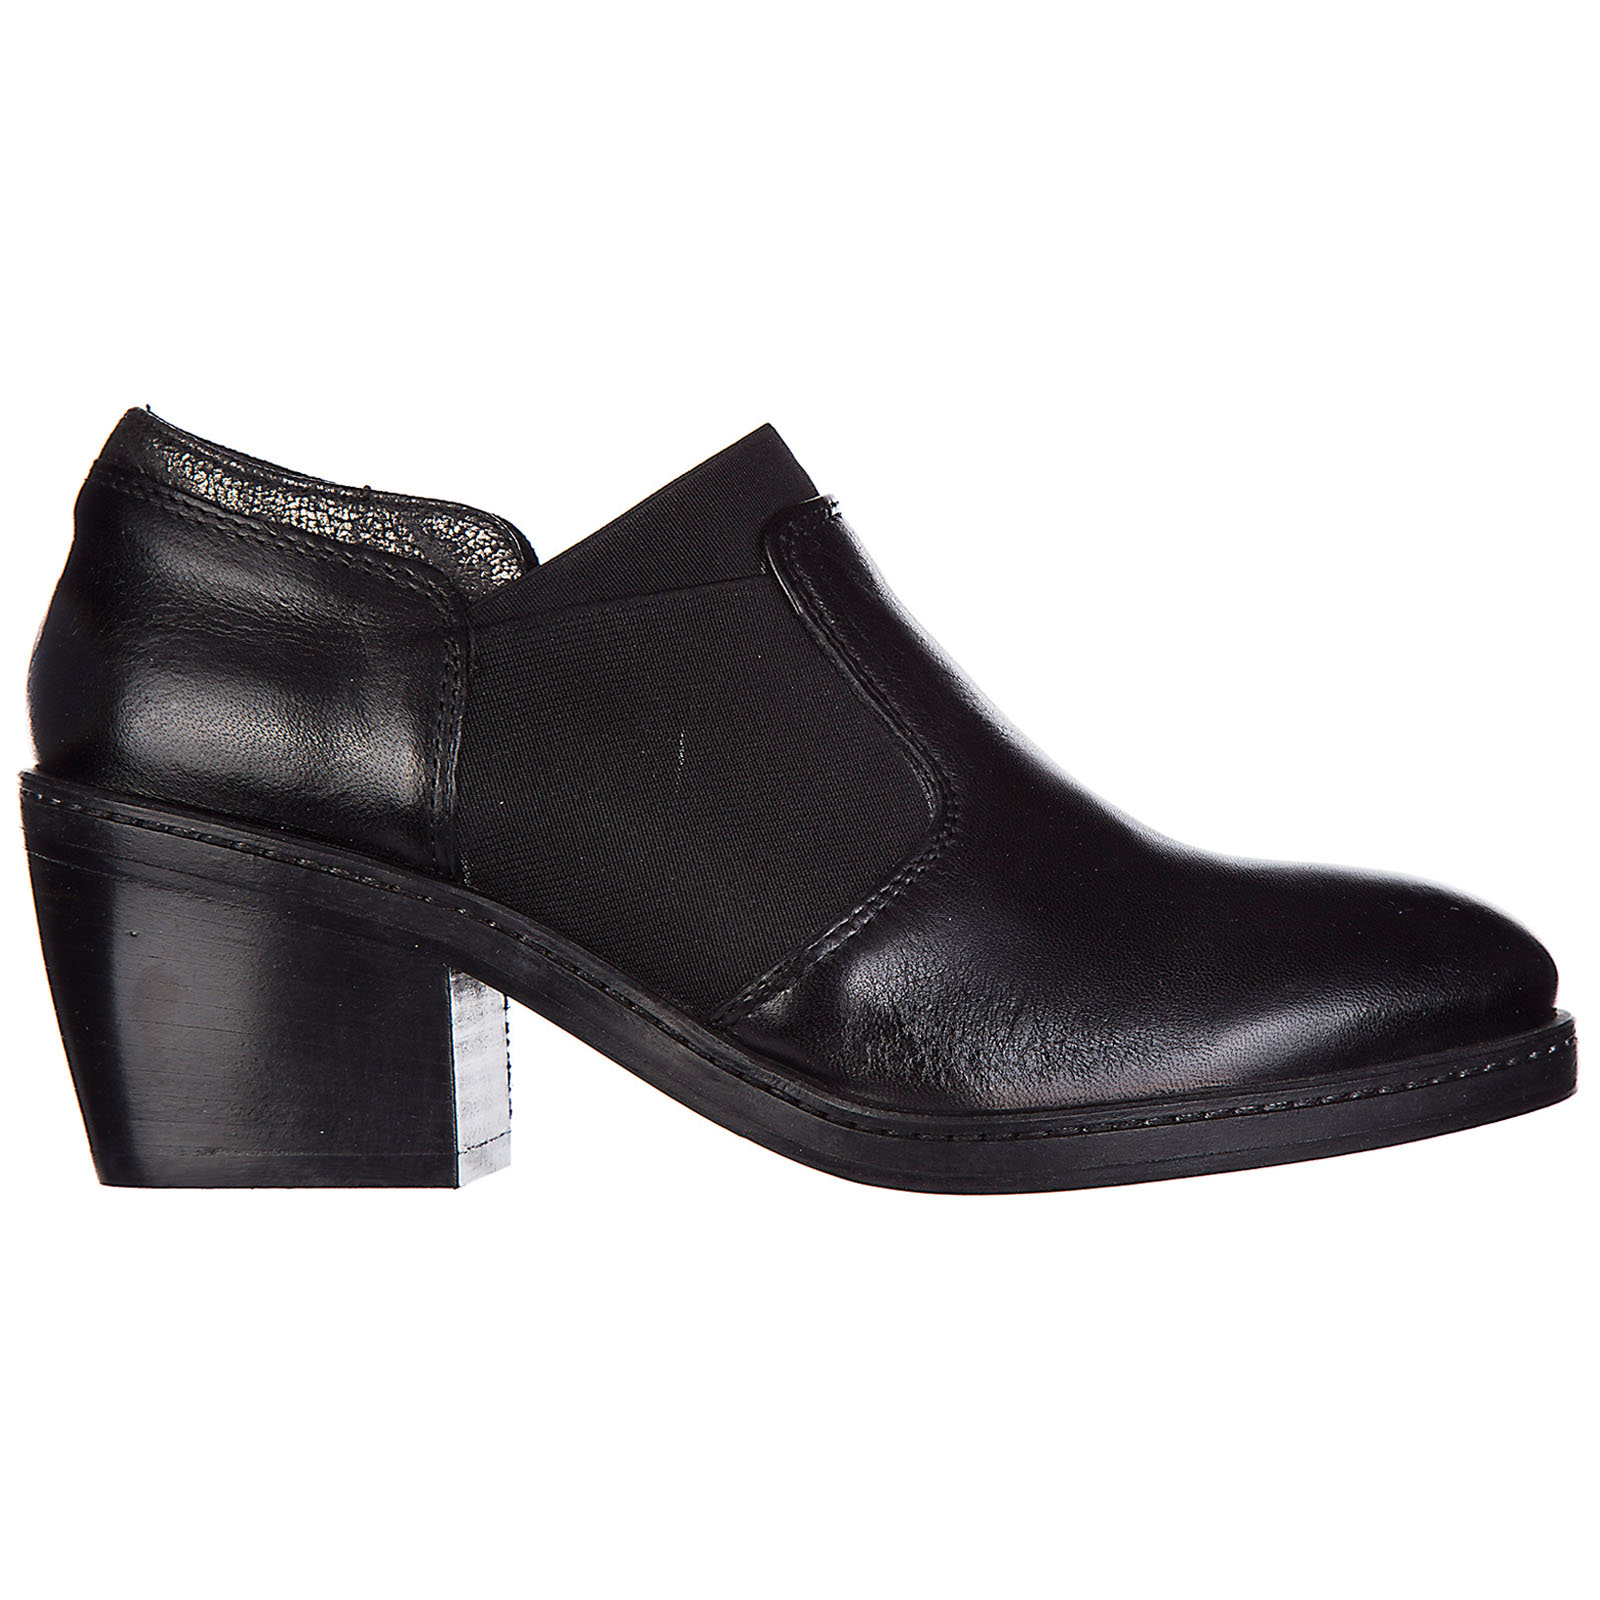 Demi bottes femme à talon en cuir tekila